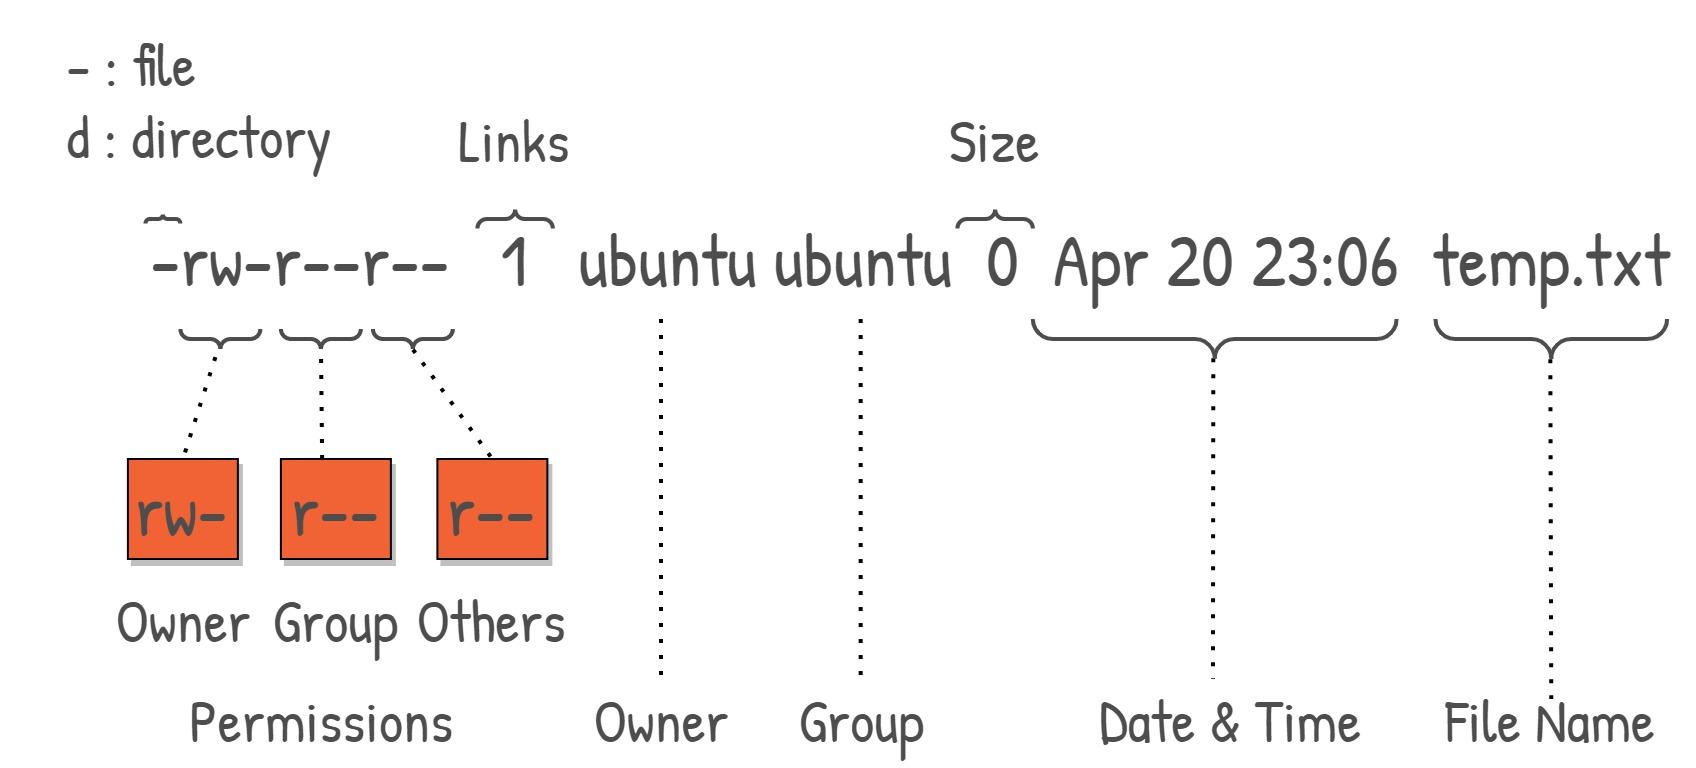 Fig.1 Long List & Permissions Explanation